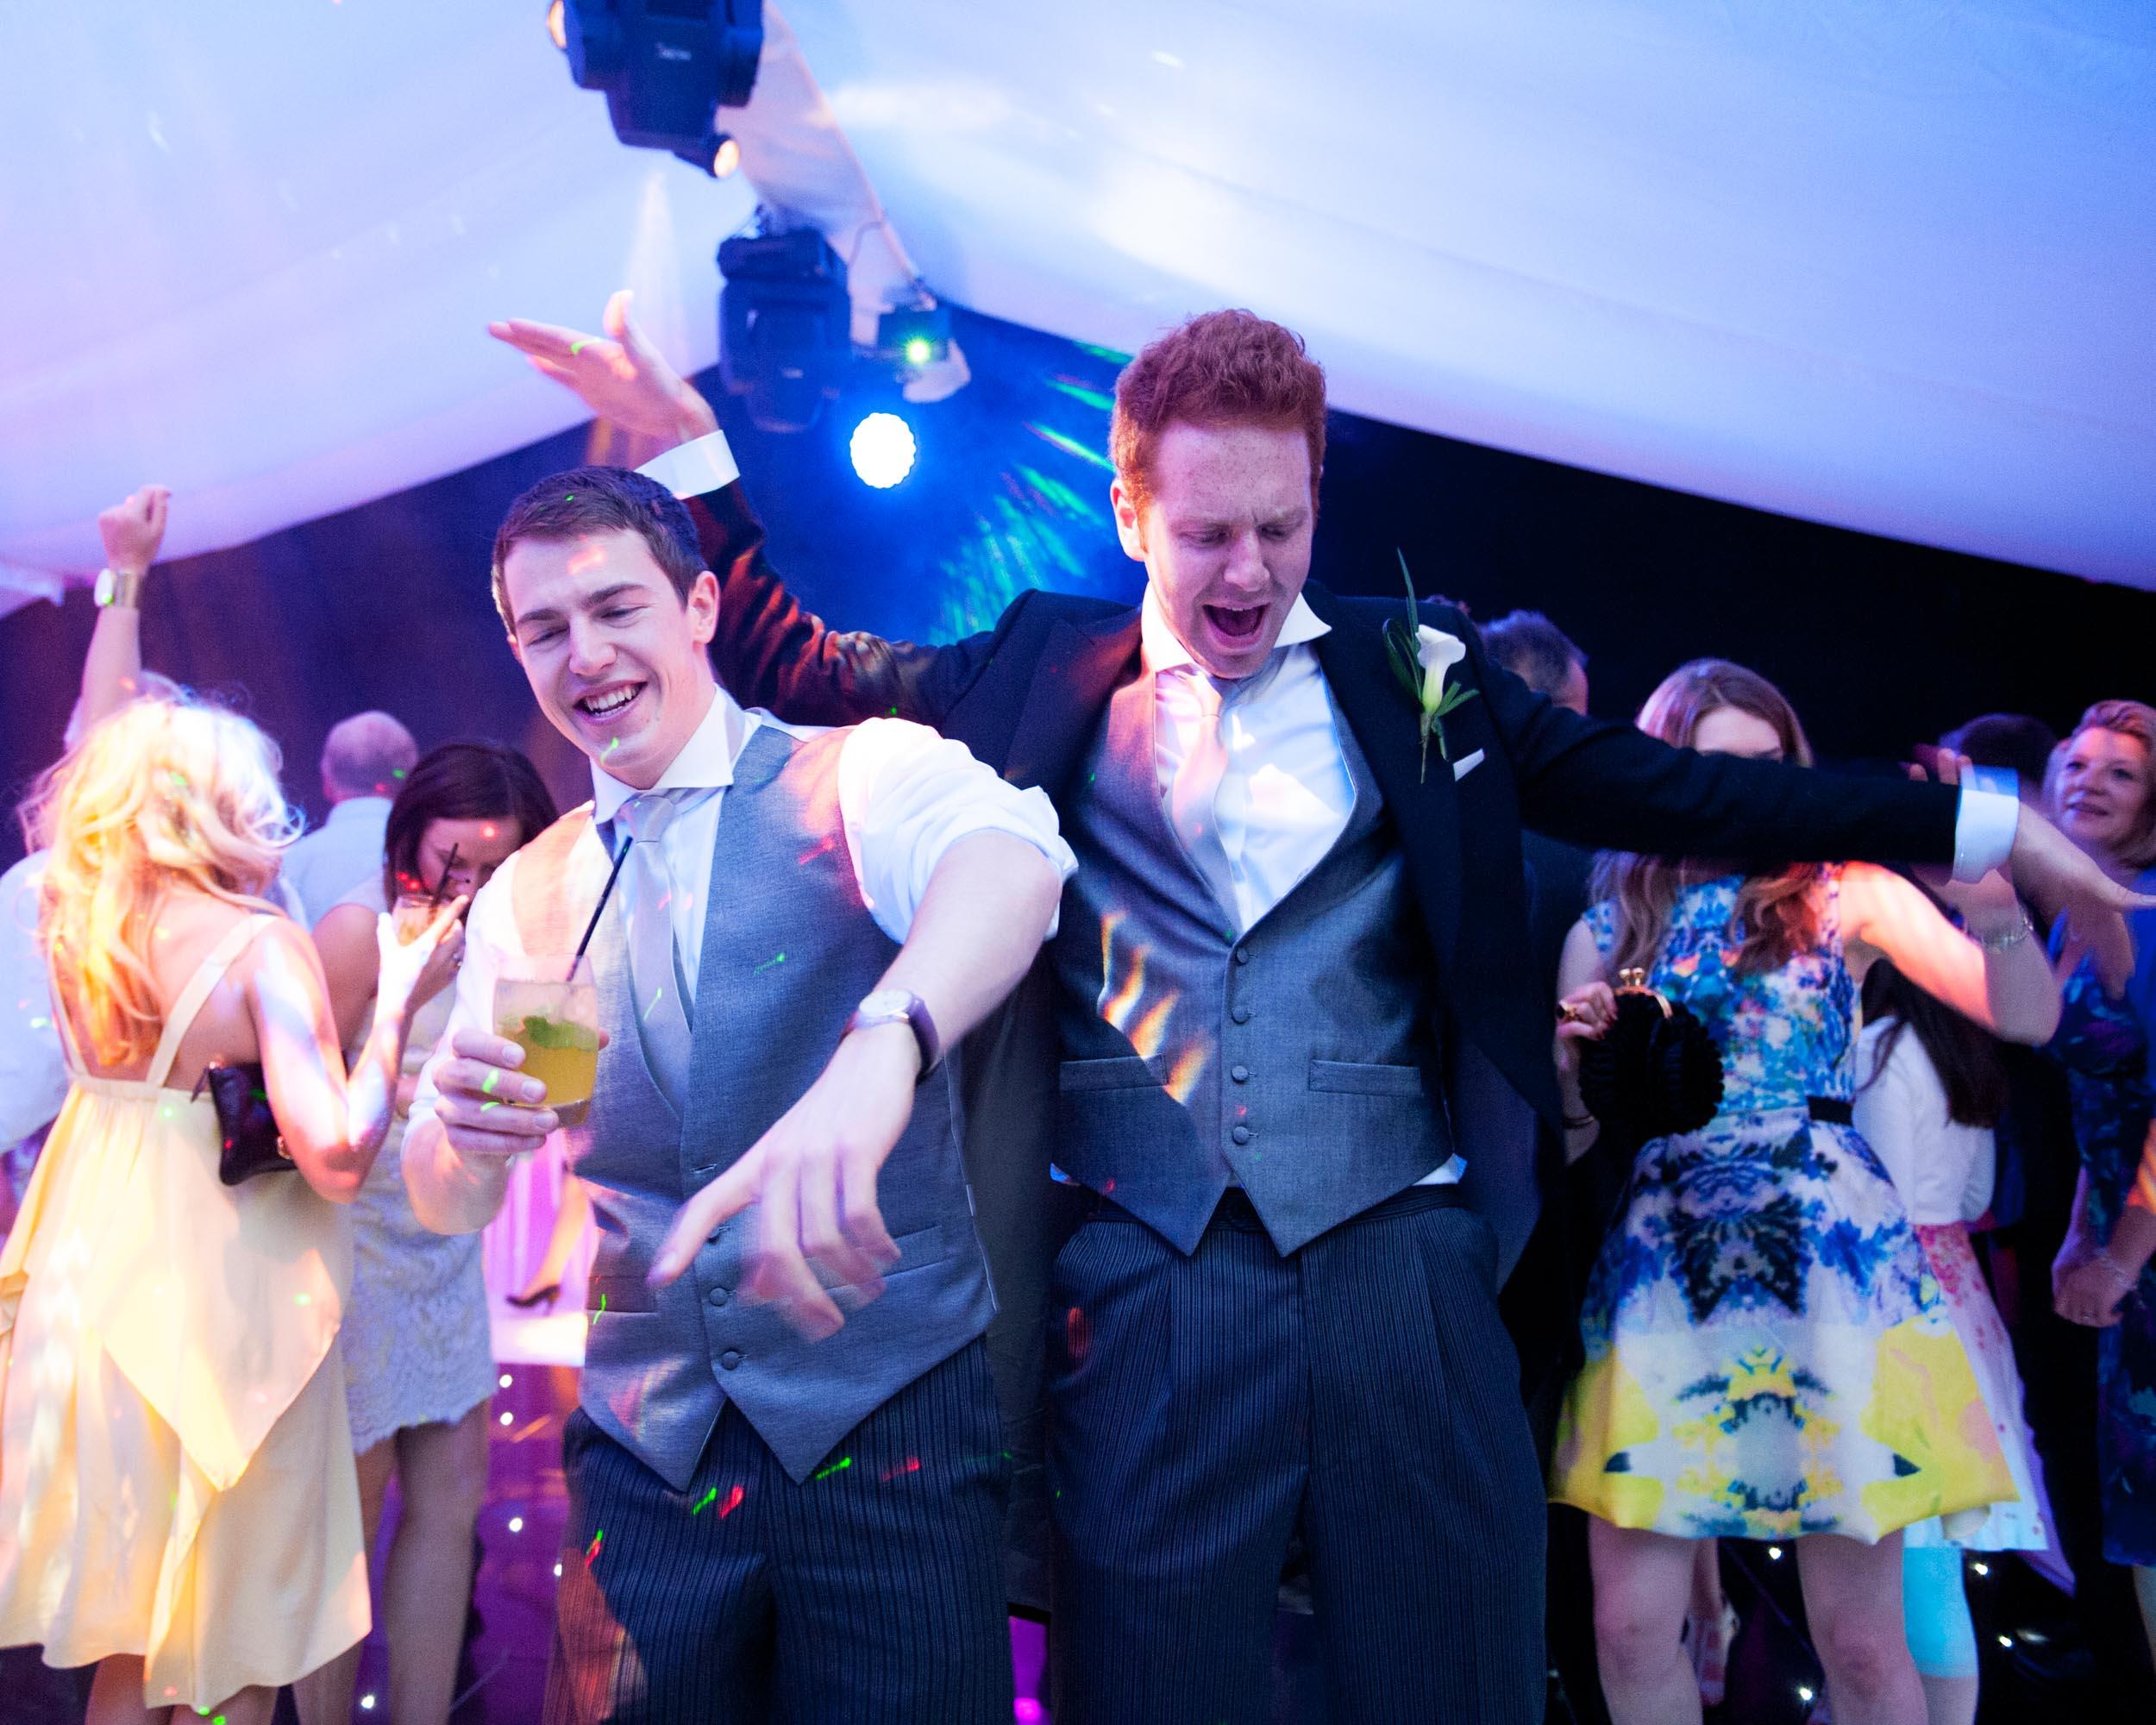 wedding-pary-dancing-1.jpg